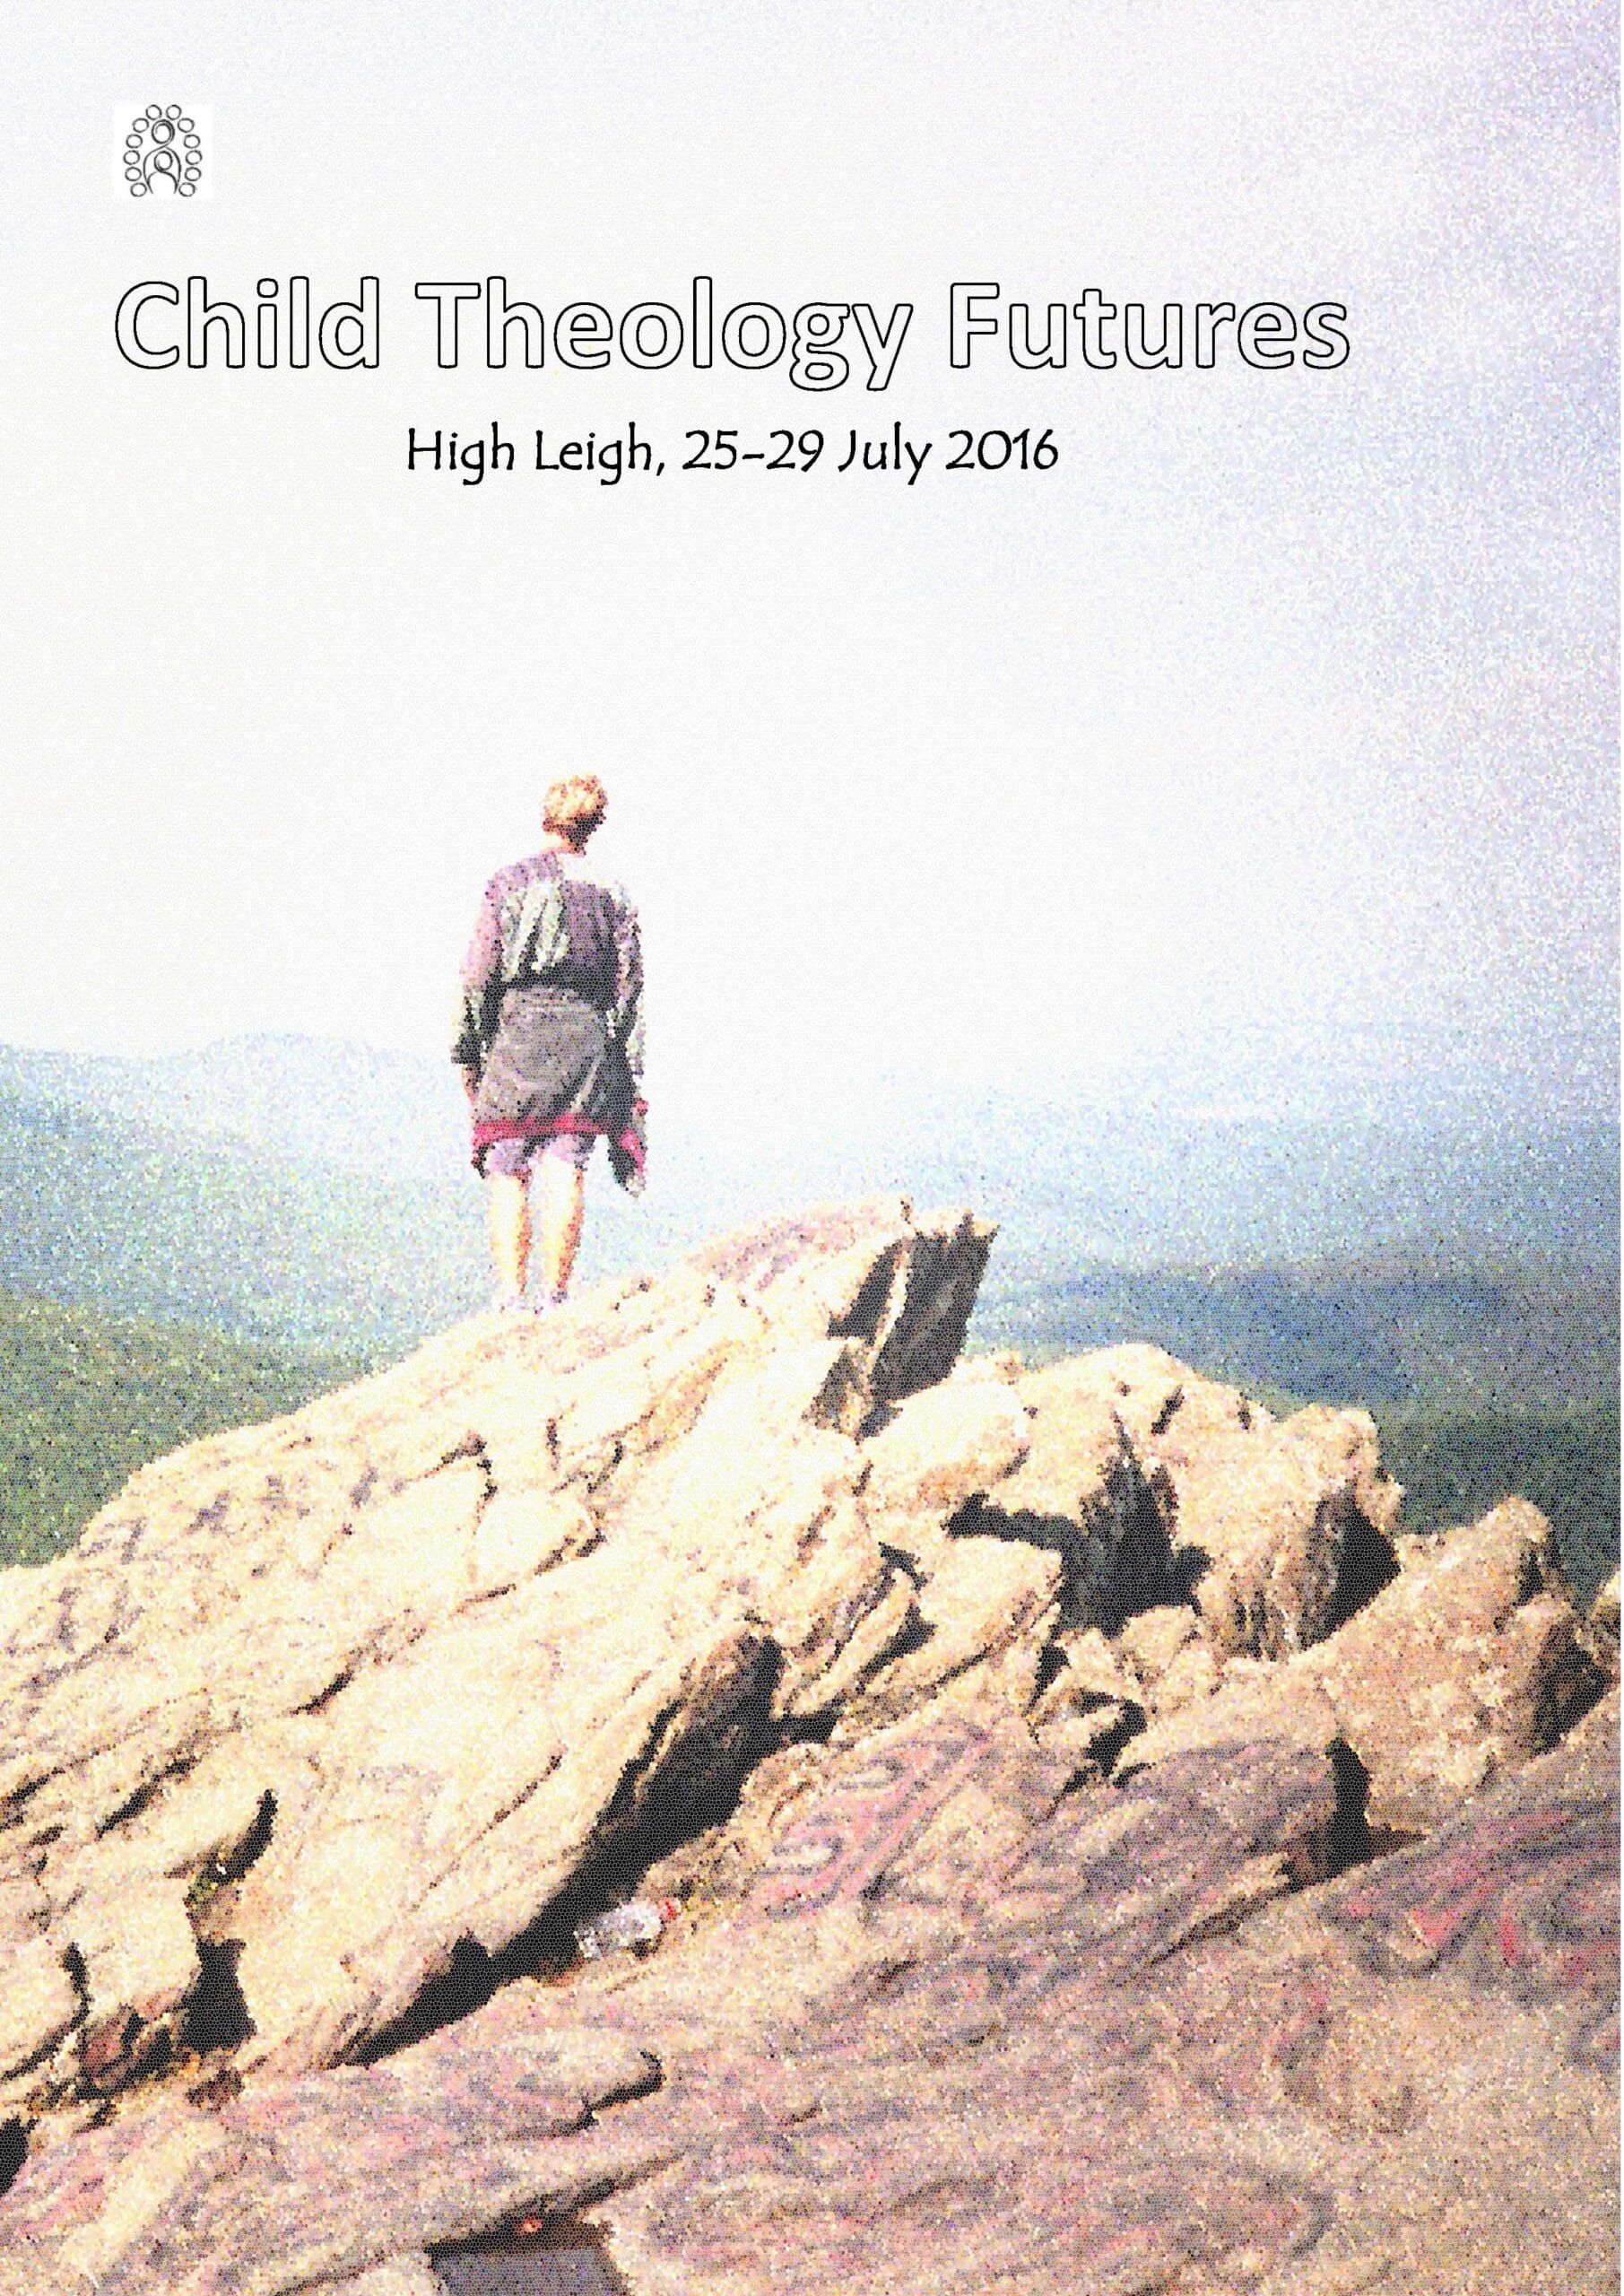 Futures High Leigh 25th-29th July 2016